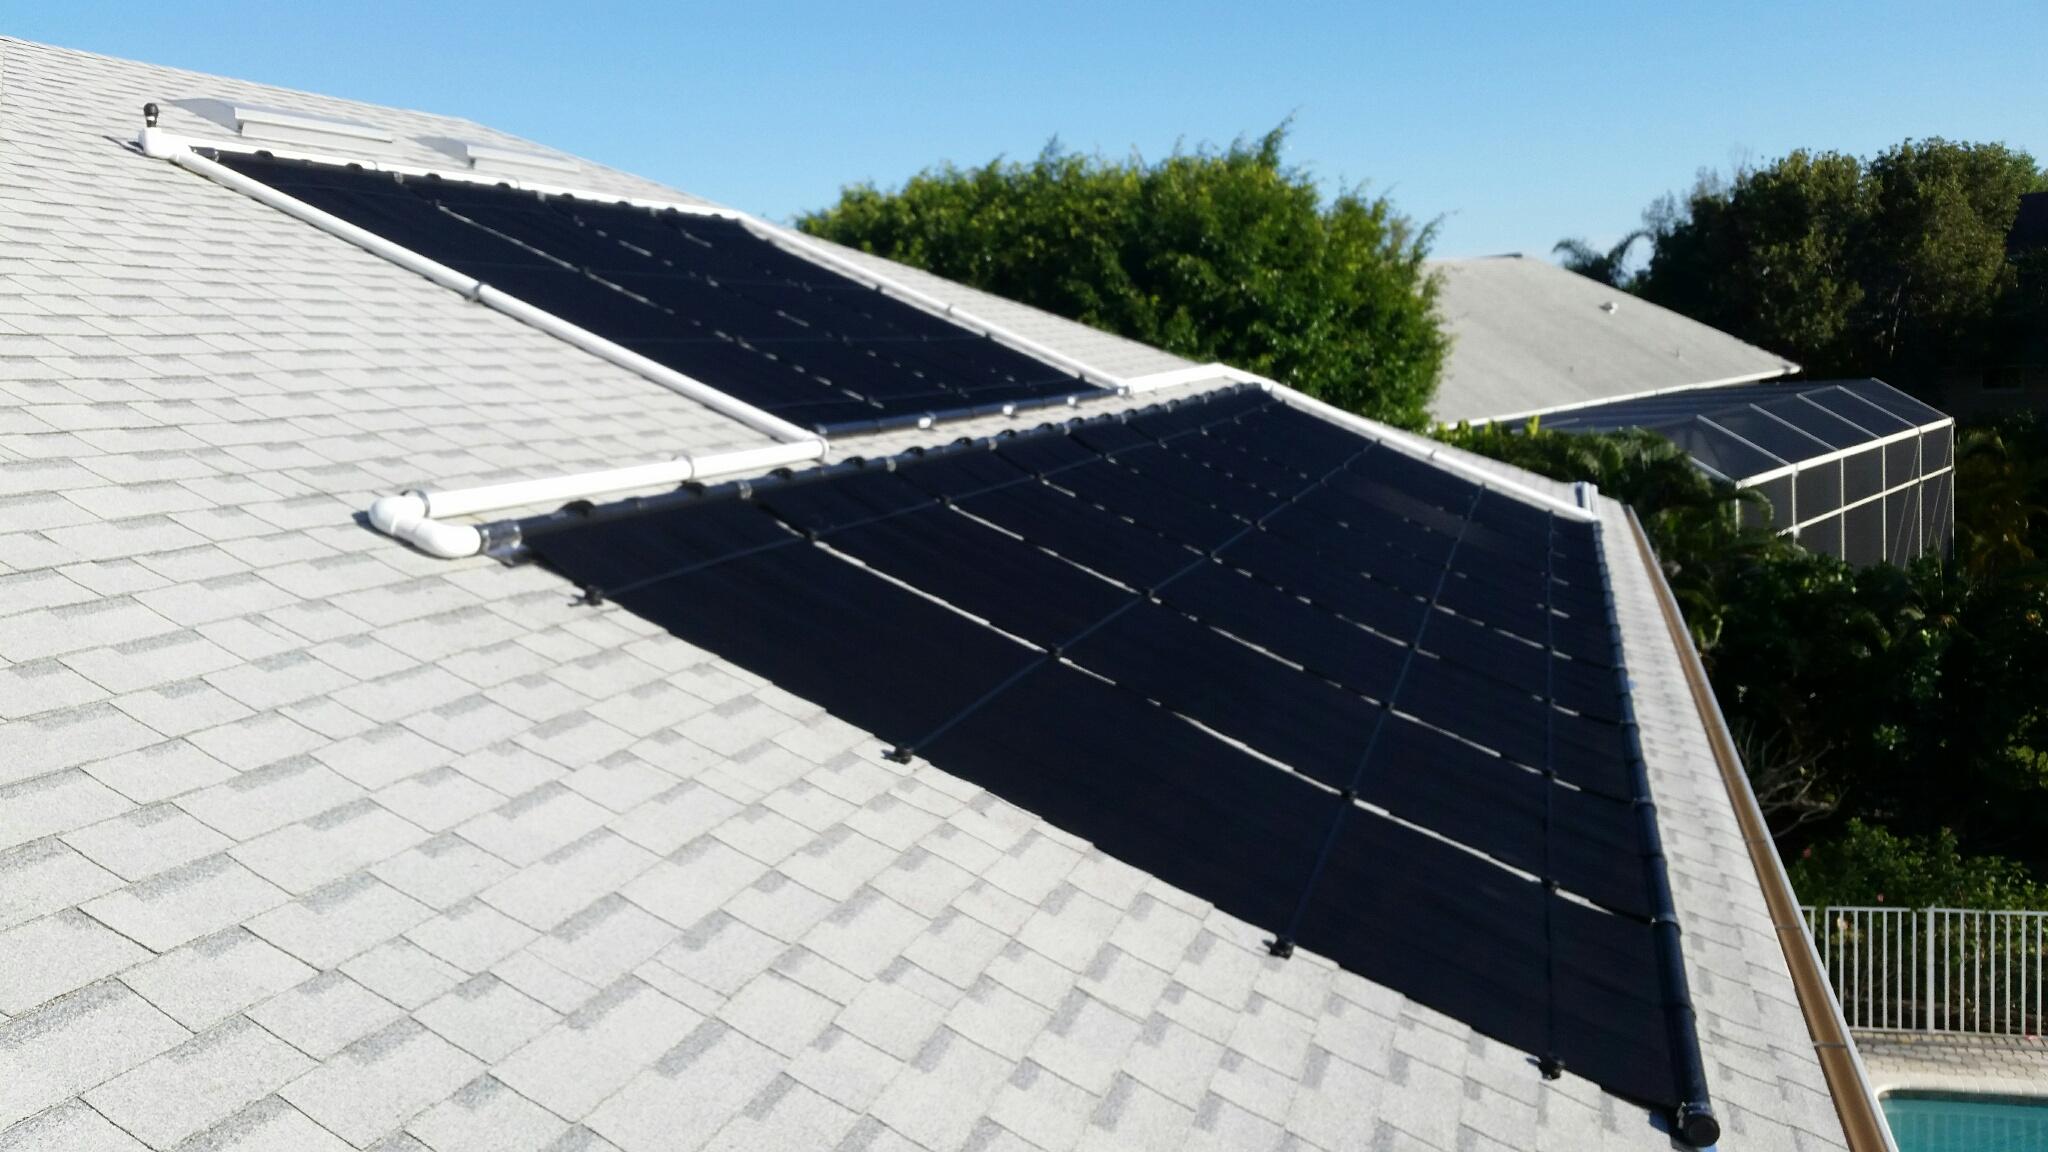 iSwim Solar Pool Heater Installation